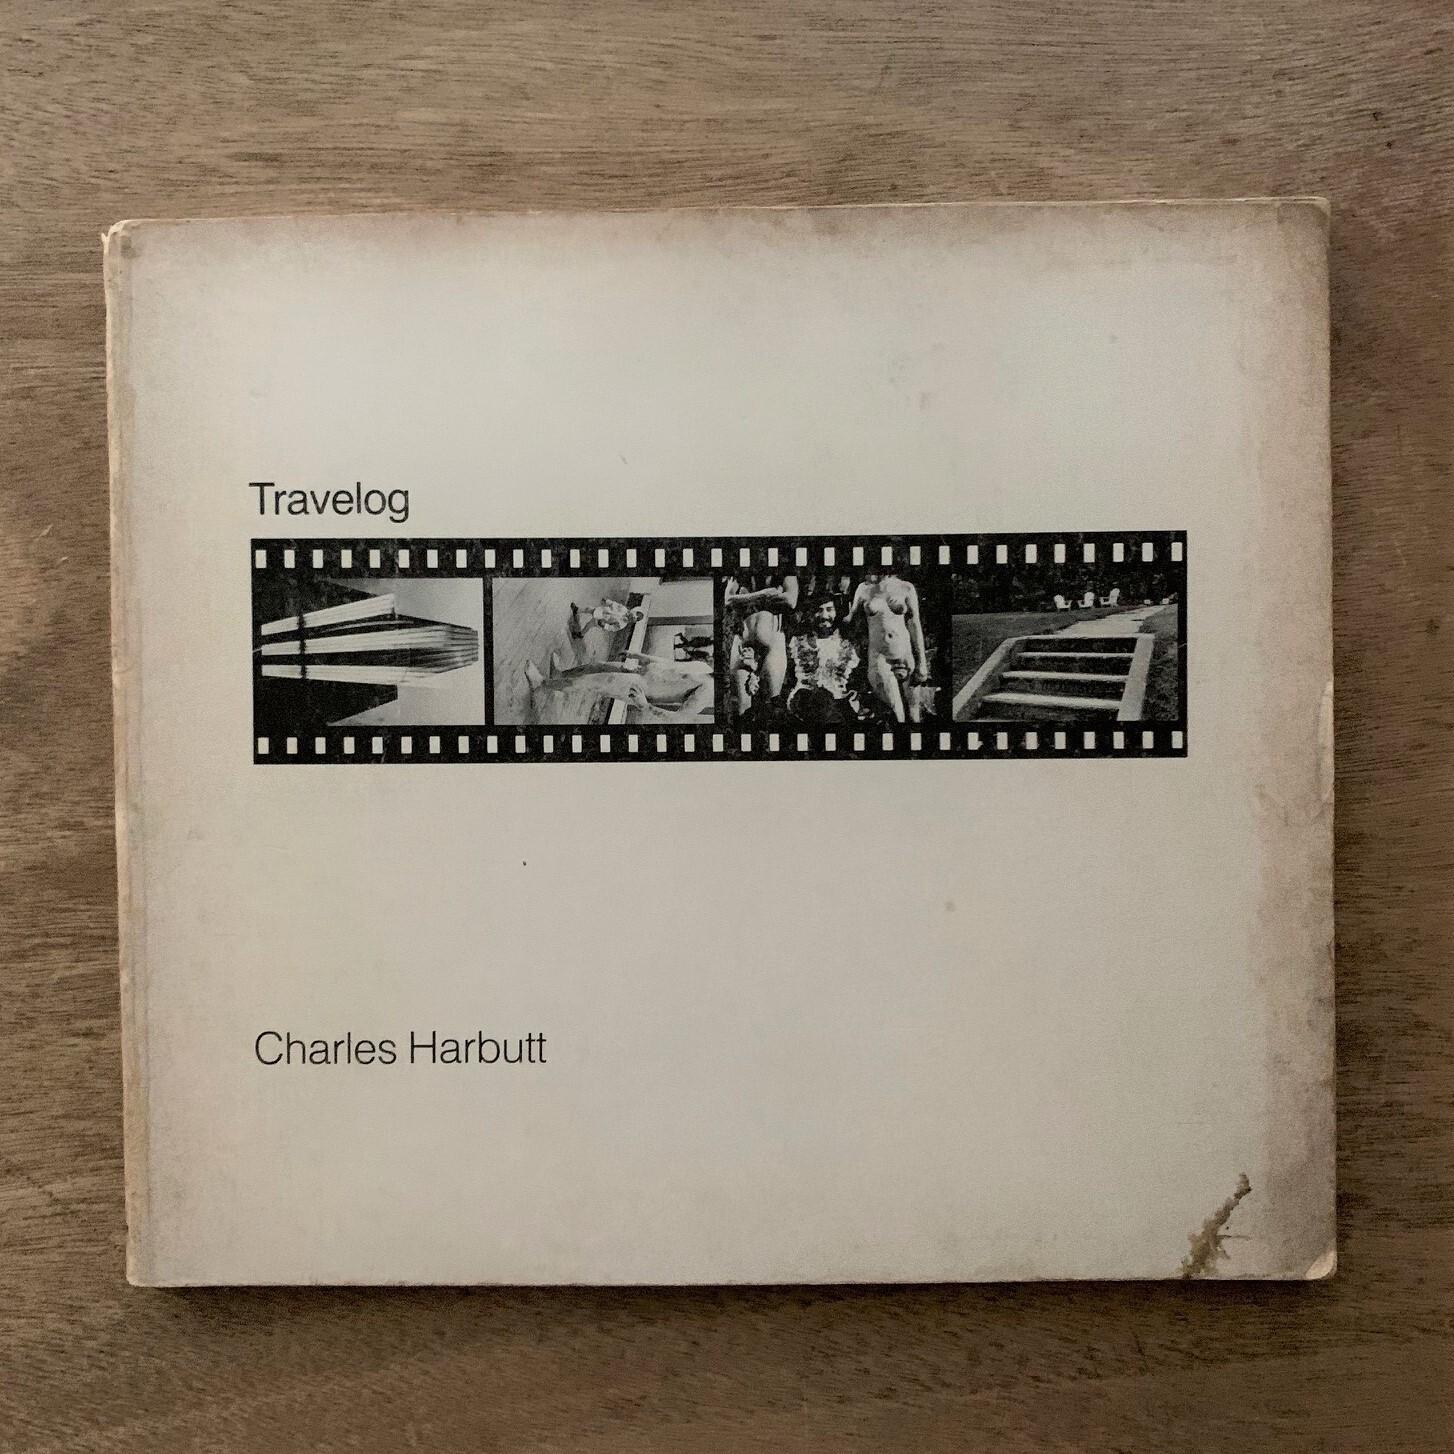 Travelog / Charles Harbutt / チャールズ・ハーバット